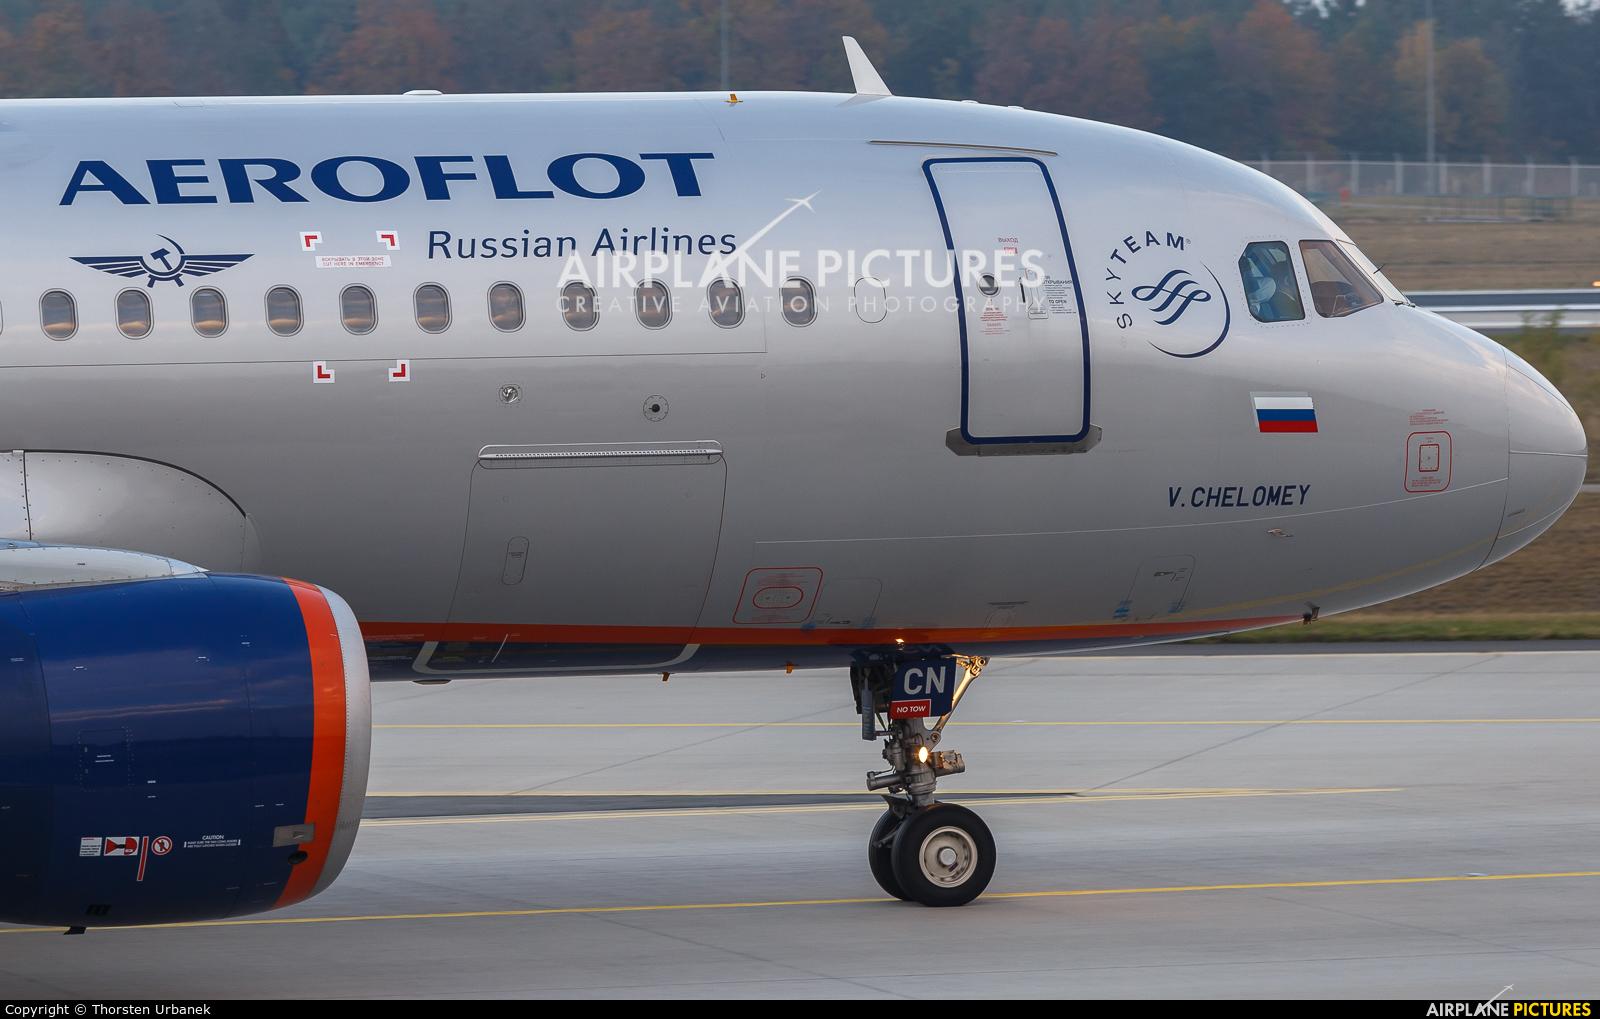 Aeroflot VQ-BCN aircraft at Frankfurt